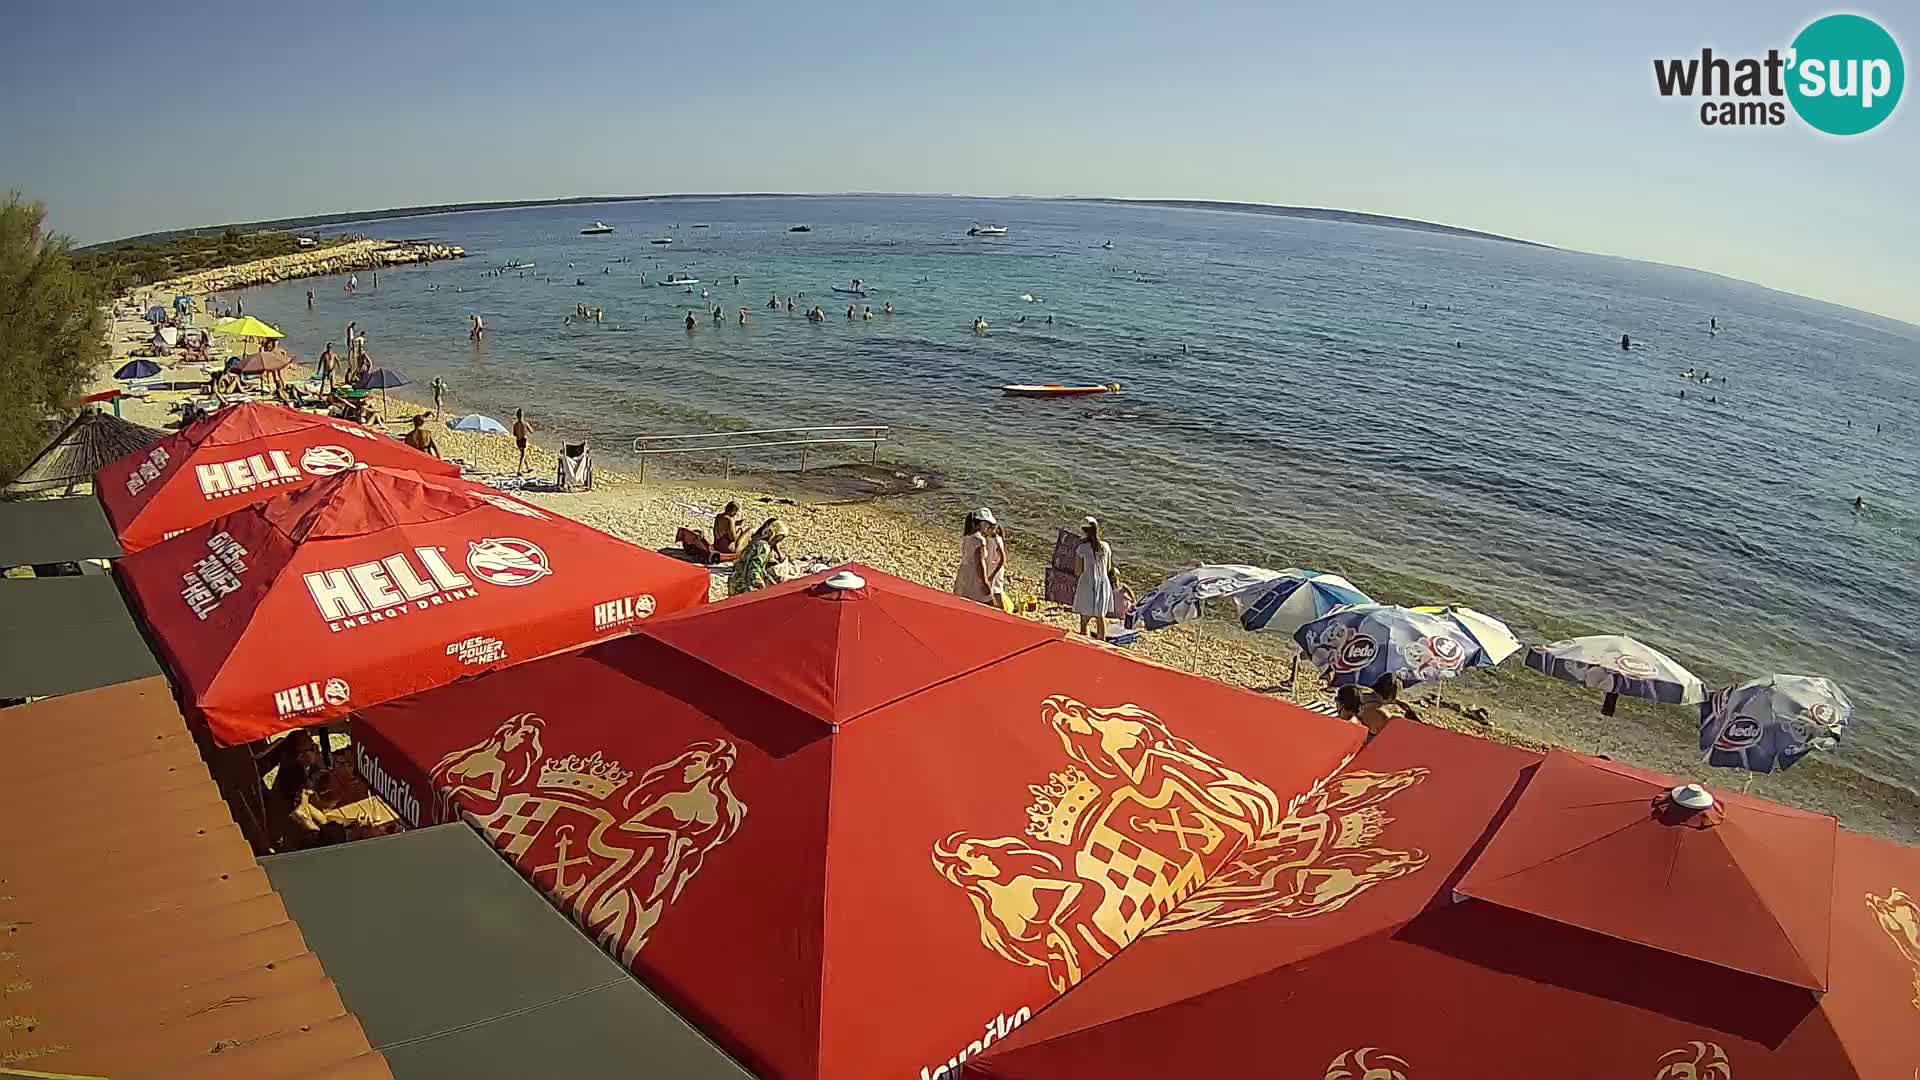 Spiaggia a Gajac – Pag